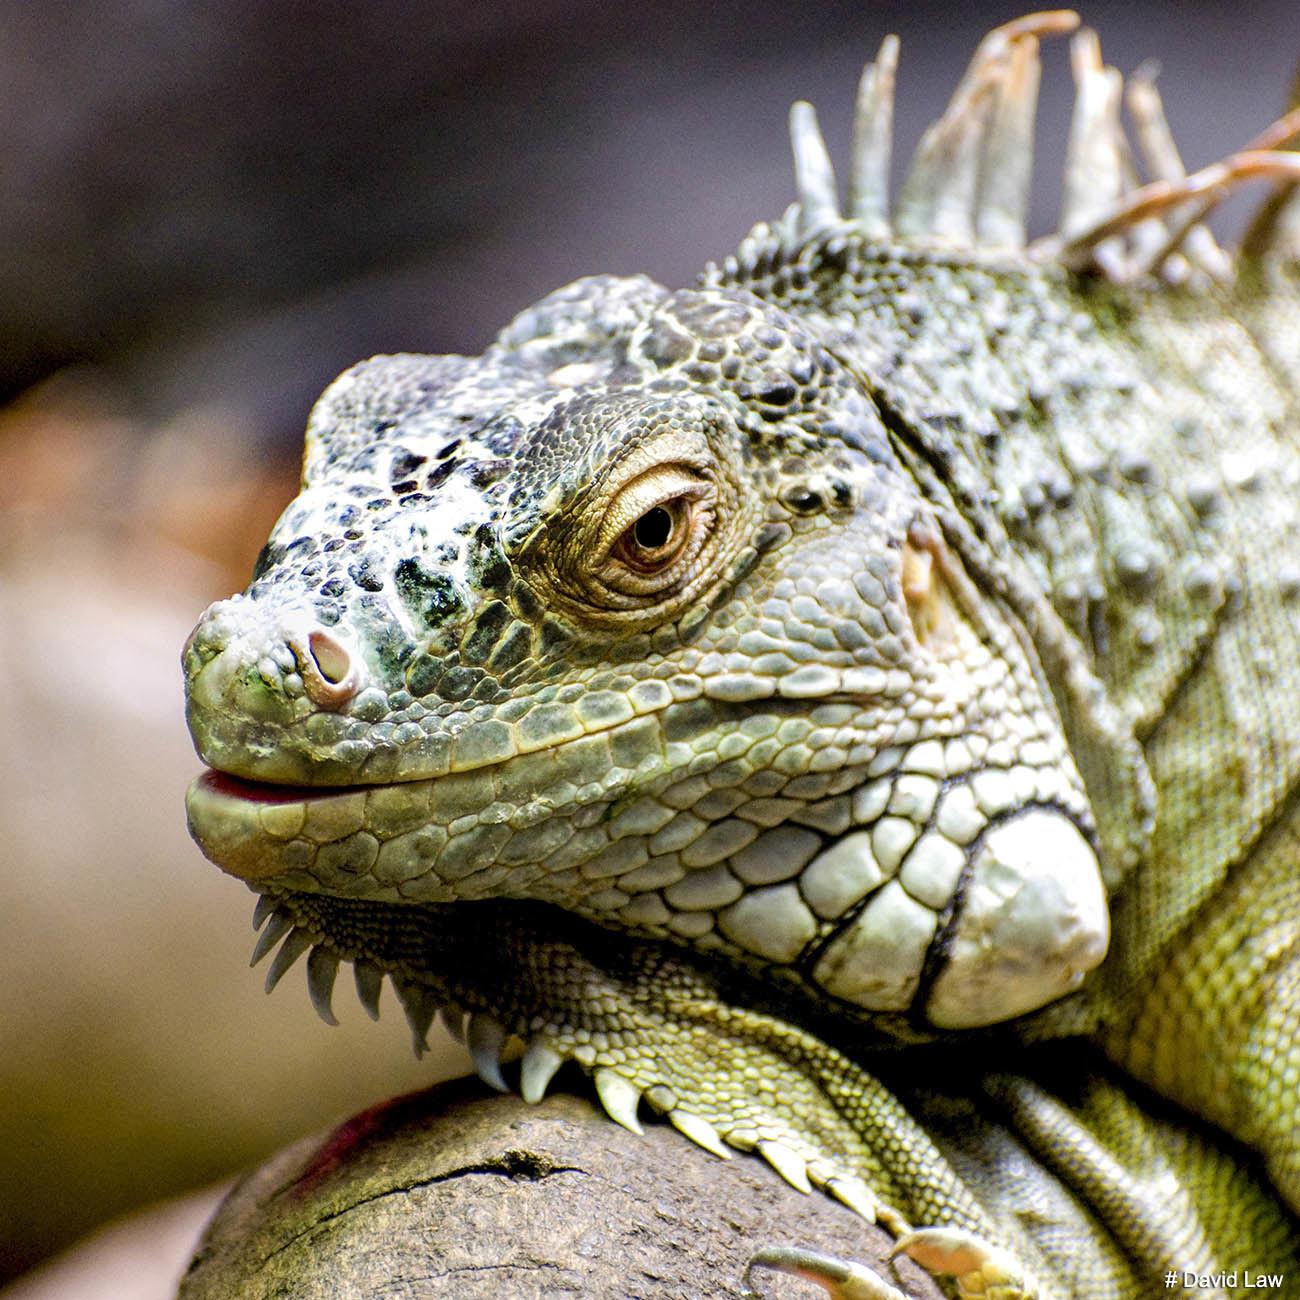 Lizard II Squarejpg wns s0220